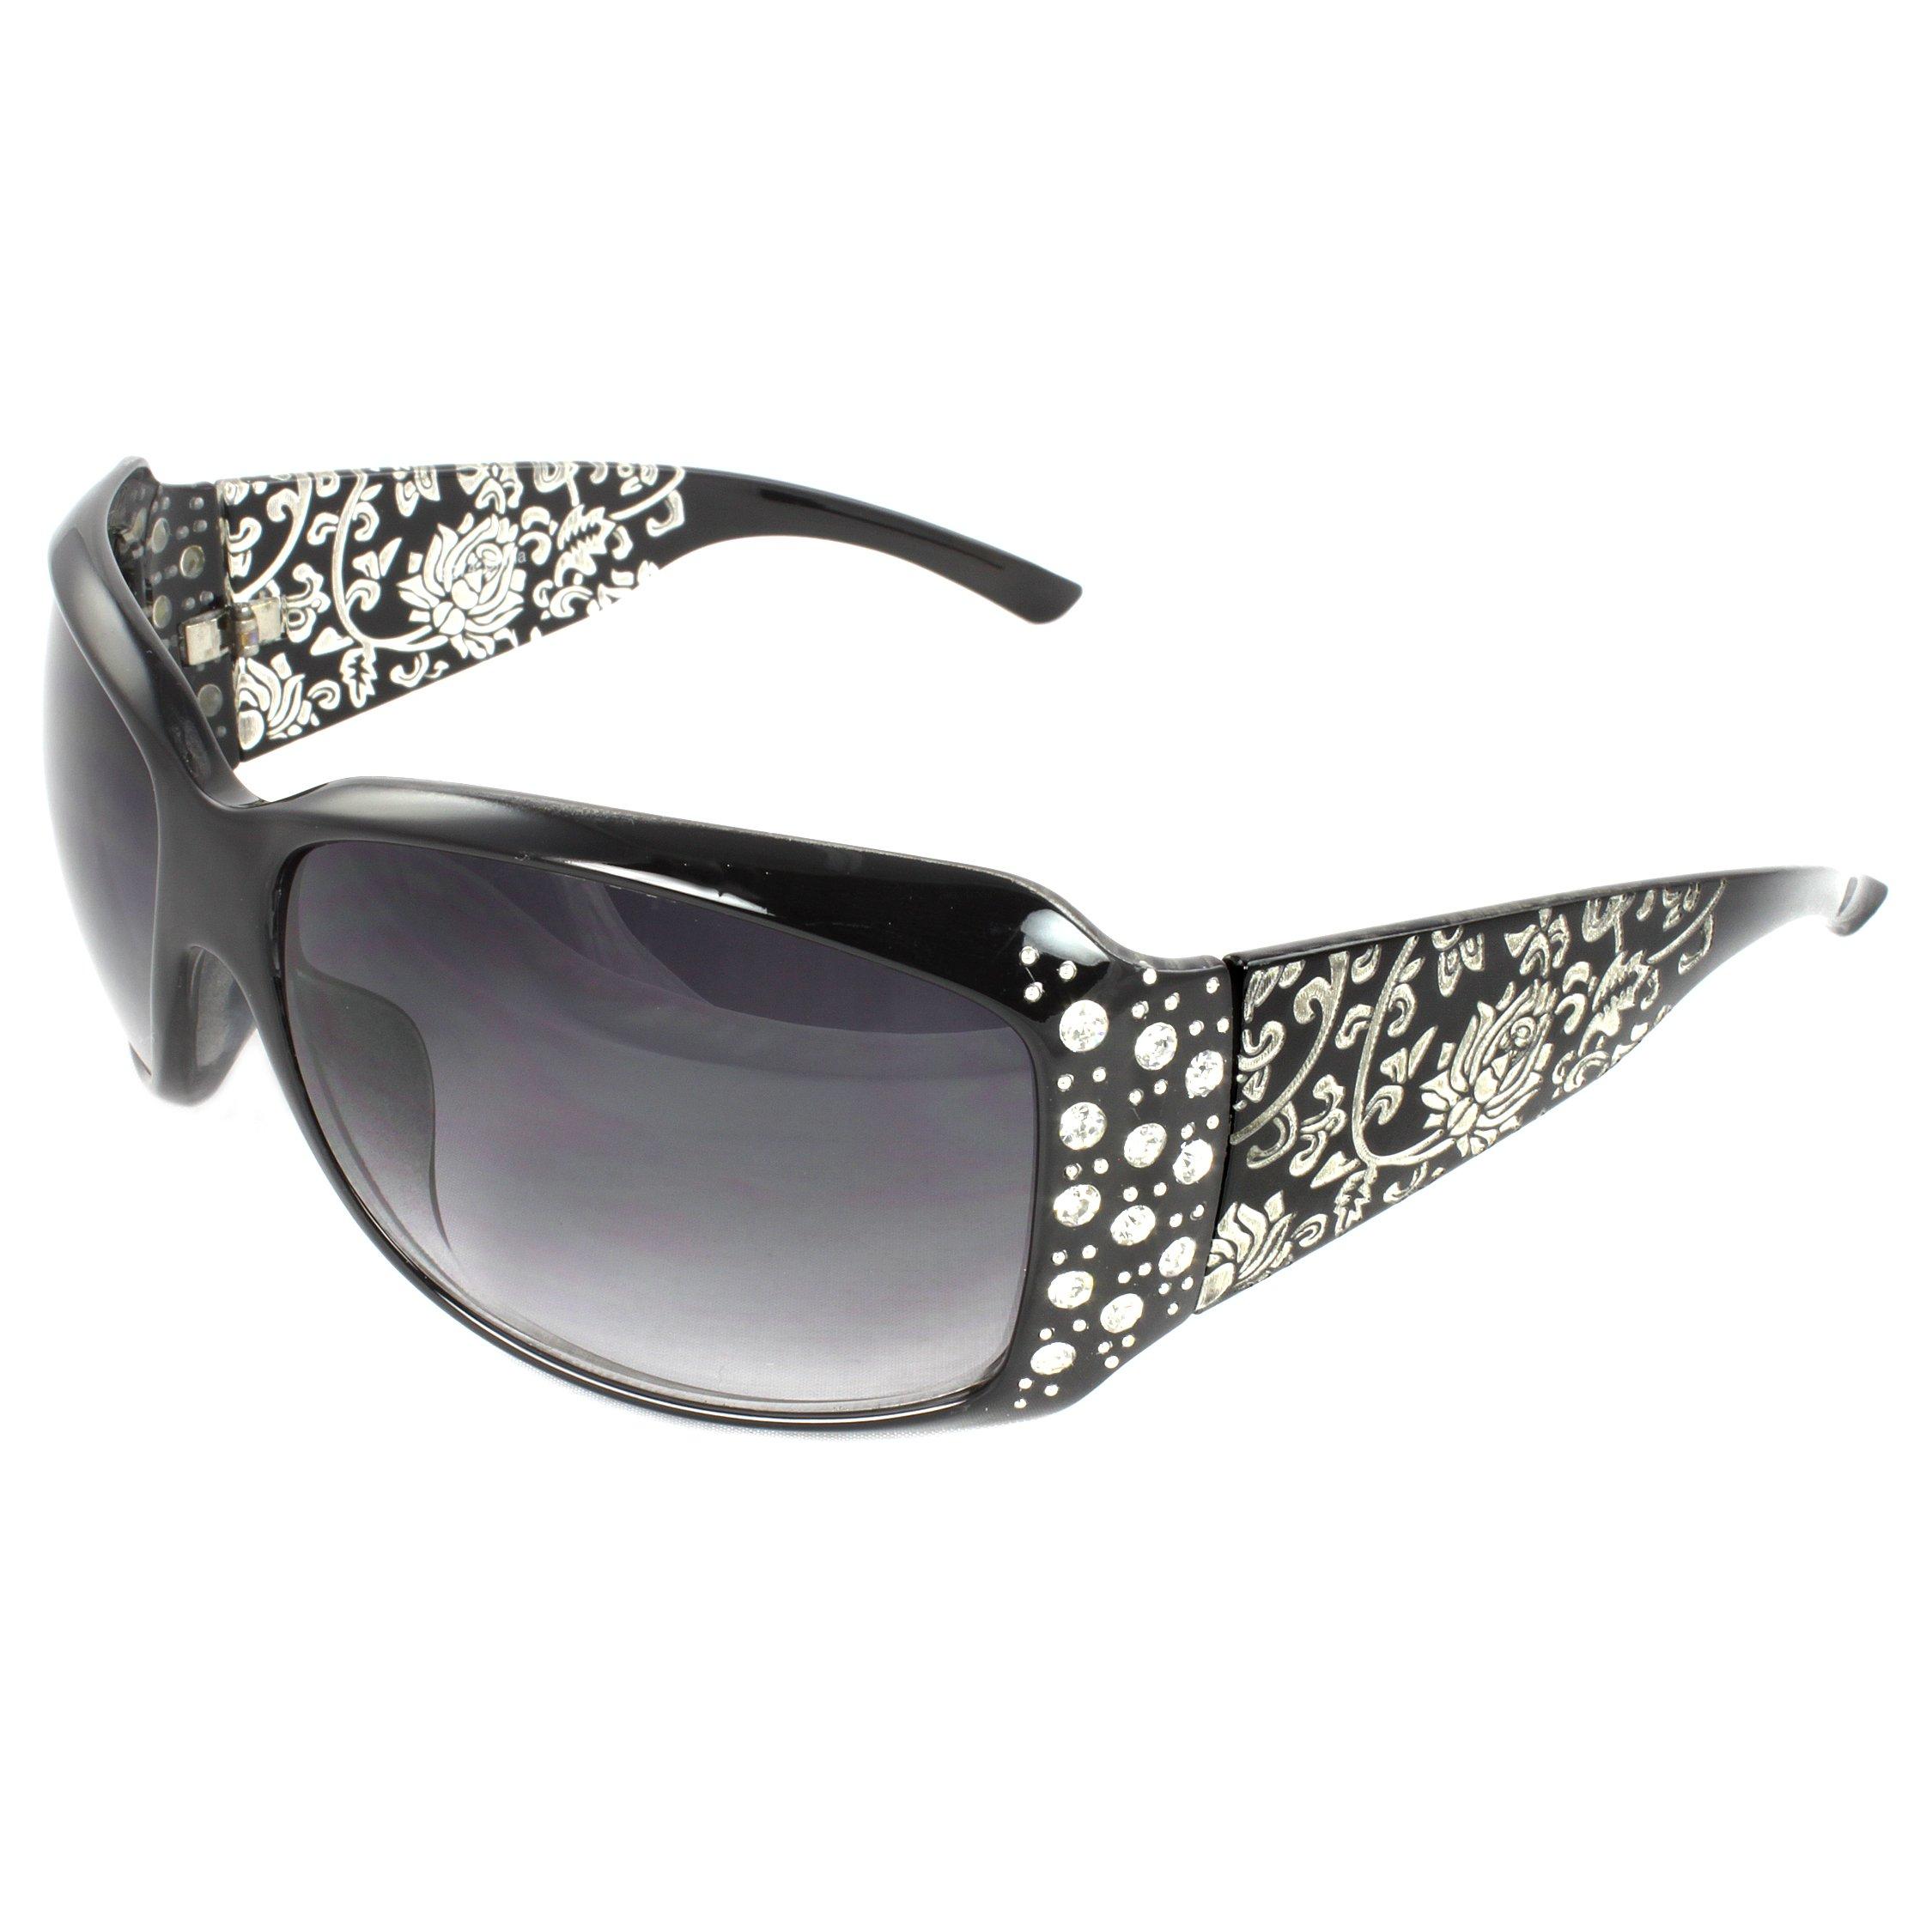 MLC EYEWEAR ® TU9274 Full Frame Fashion Sunglasses